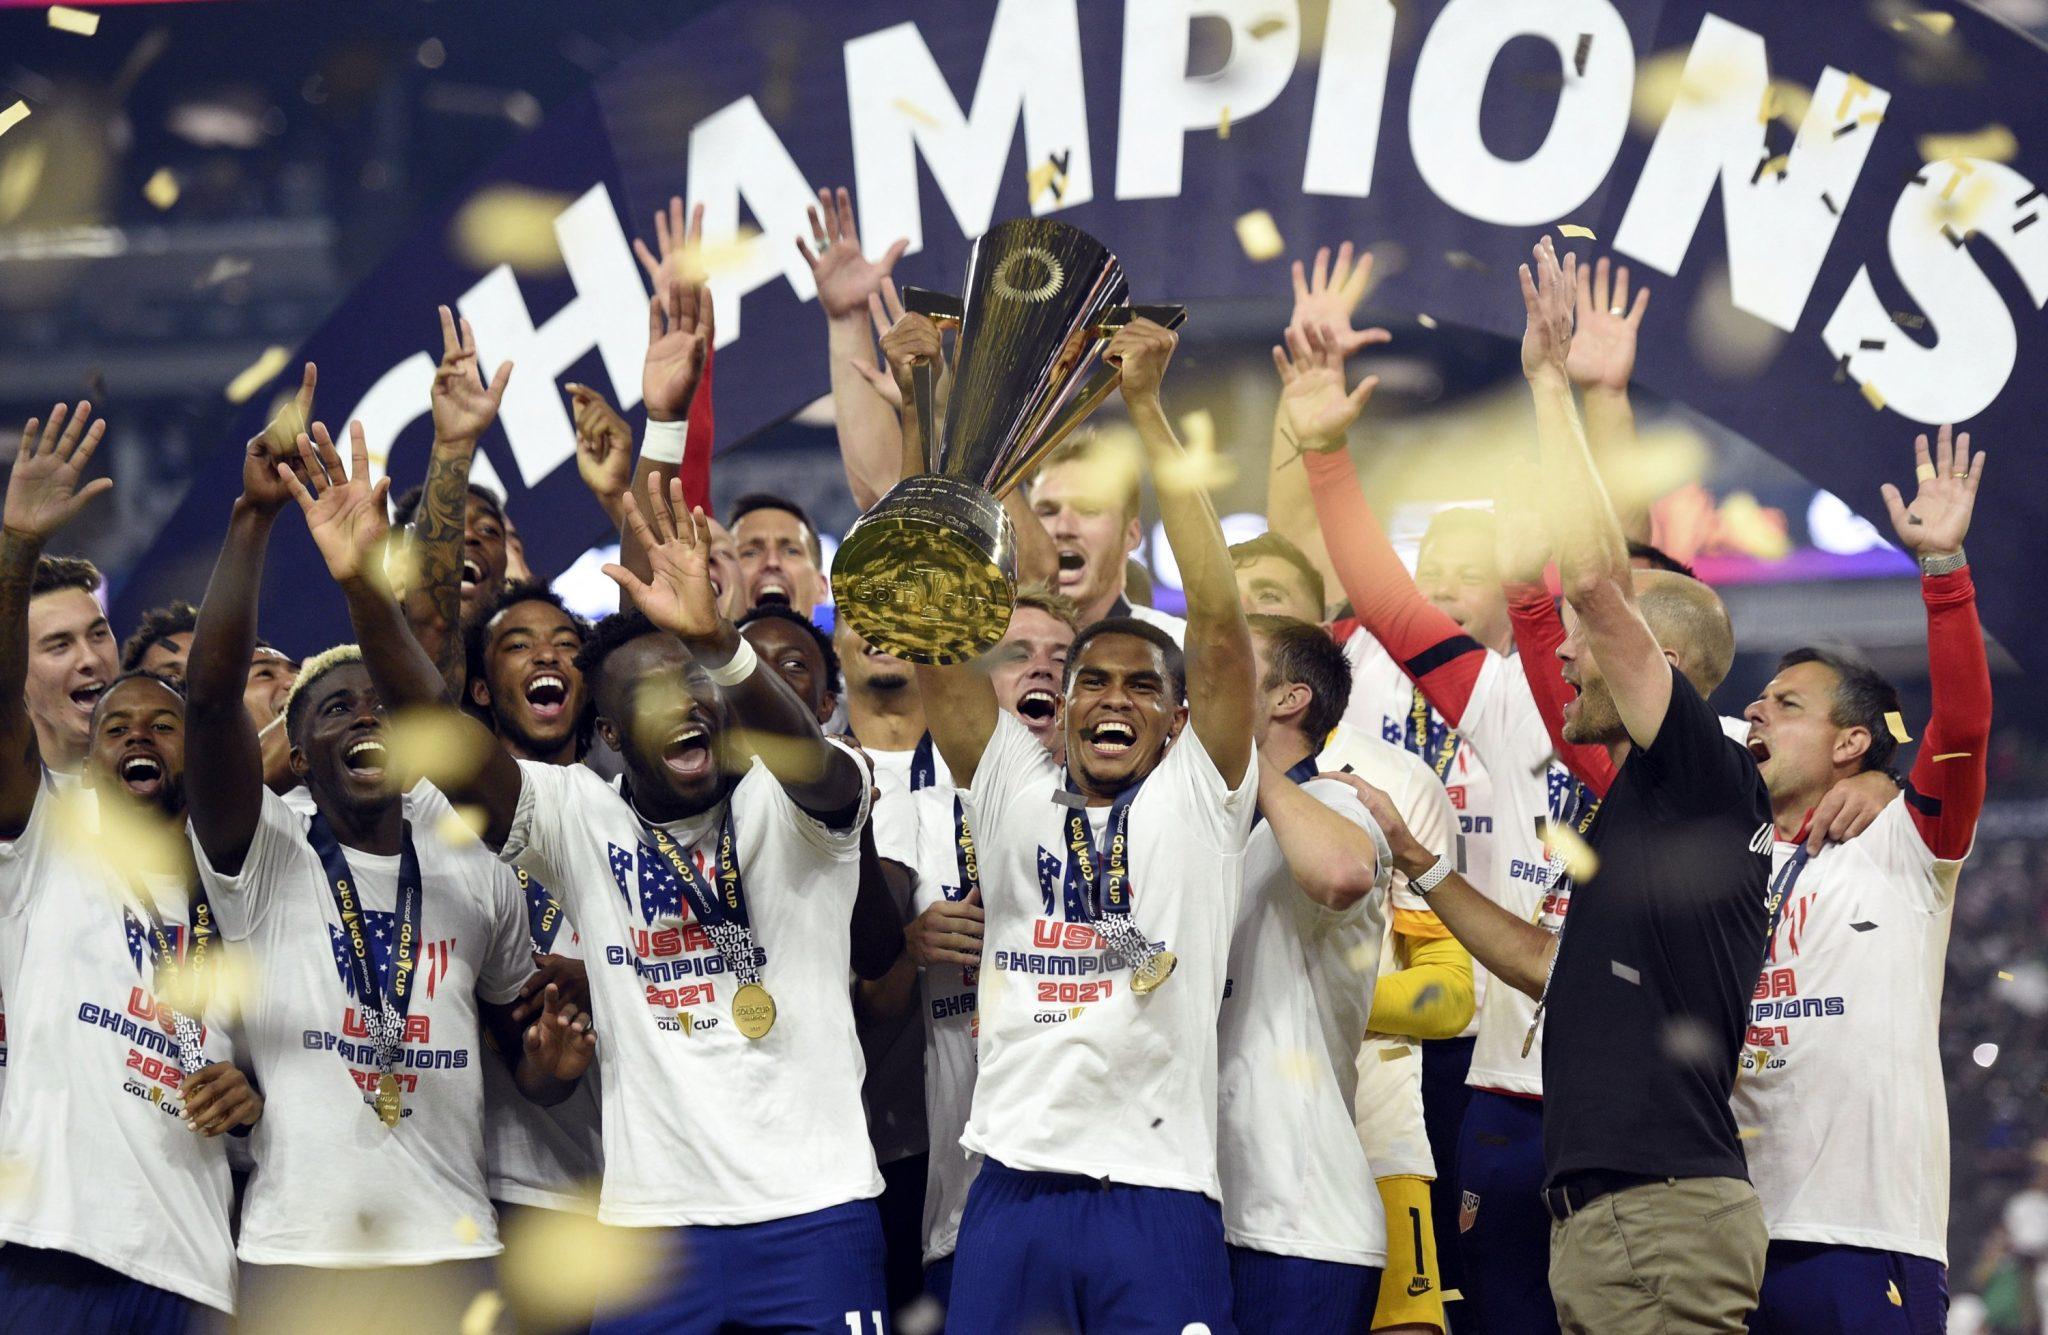 US clinches CONCACAF Gold Cup in football | கால்பந்தில் CONCACAF தங்கக் கோப்பையை அமெரிக்கா வென்றது |_40.1